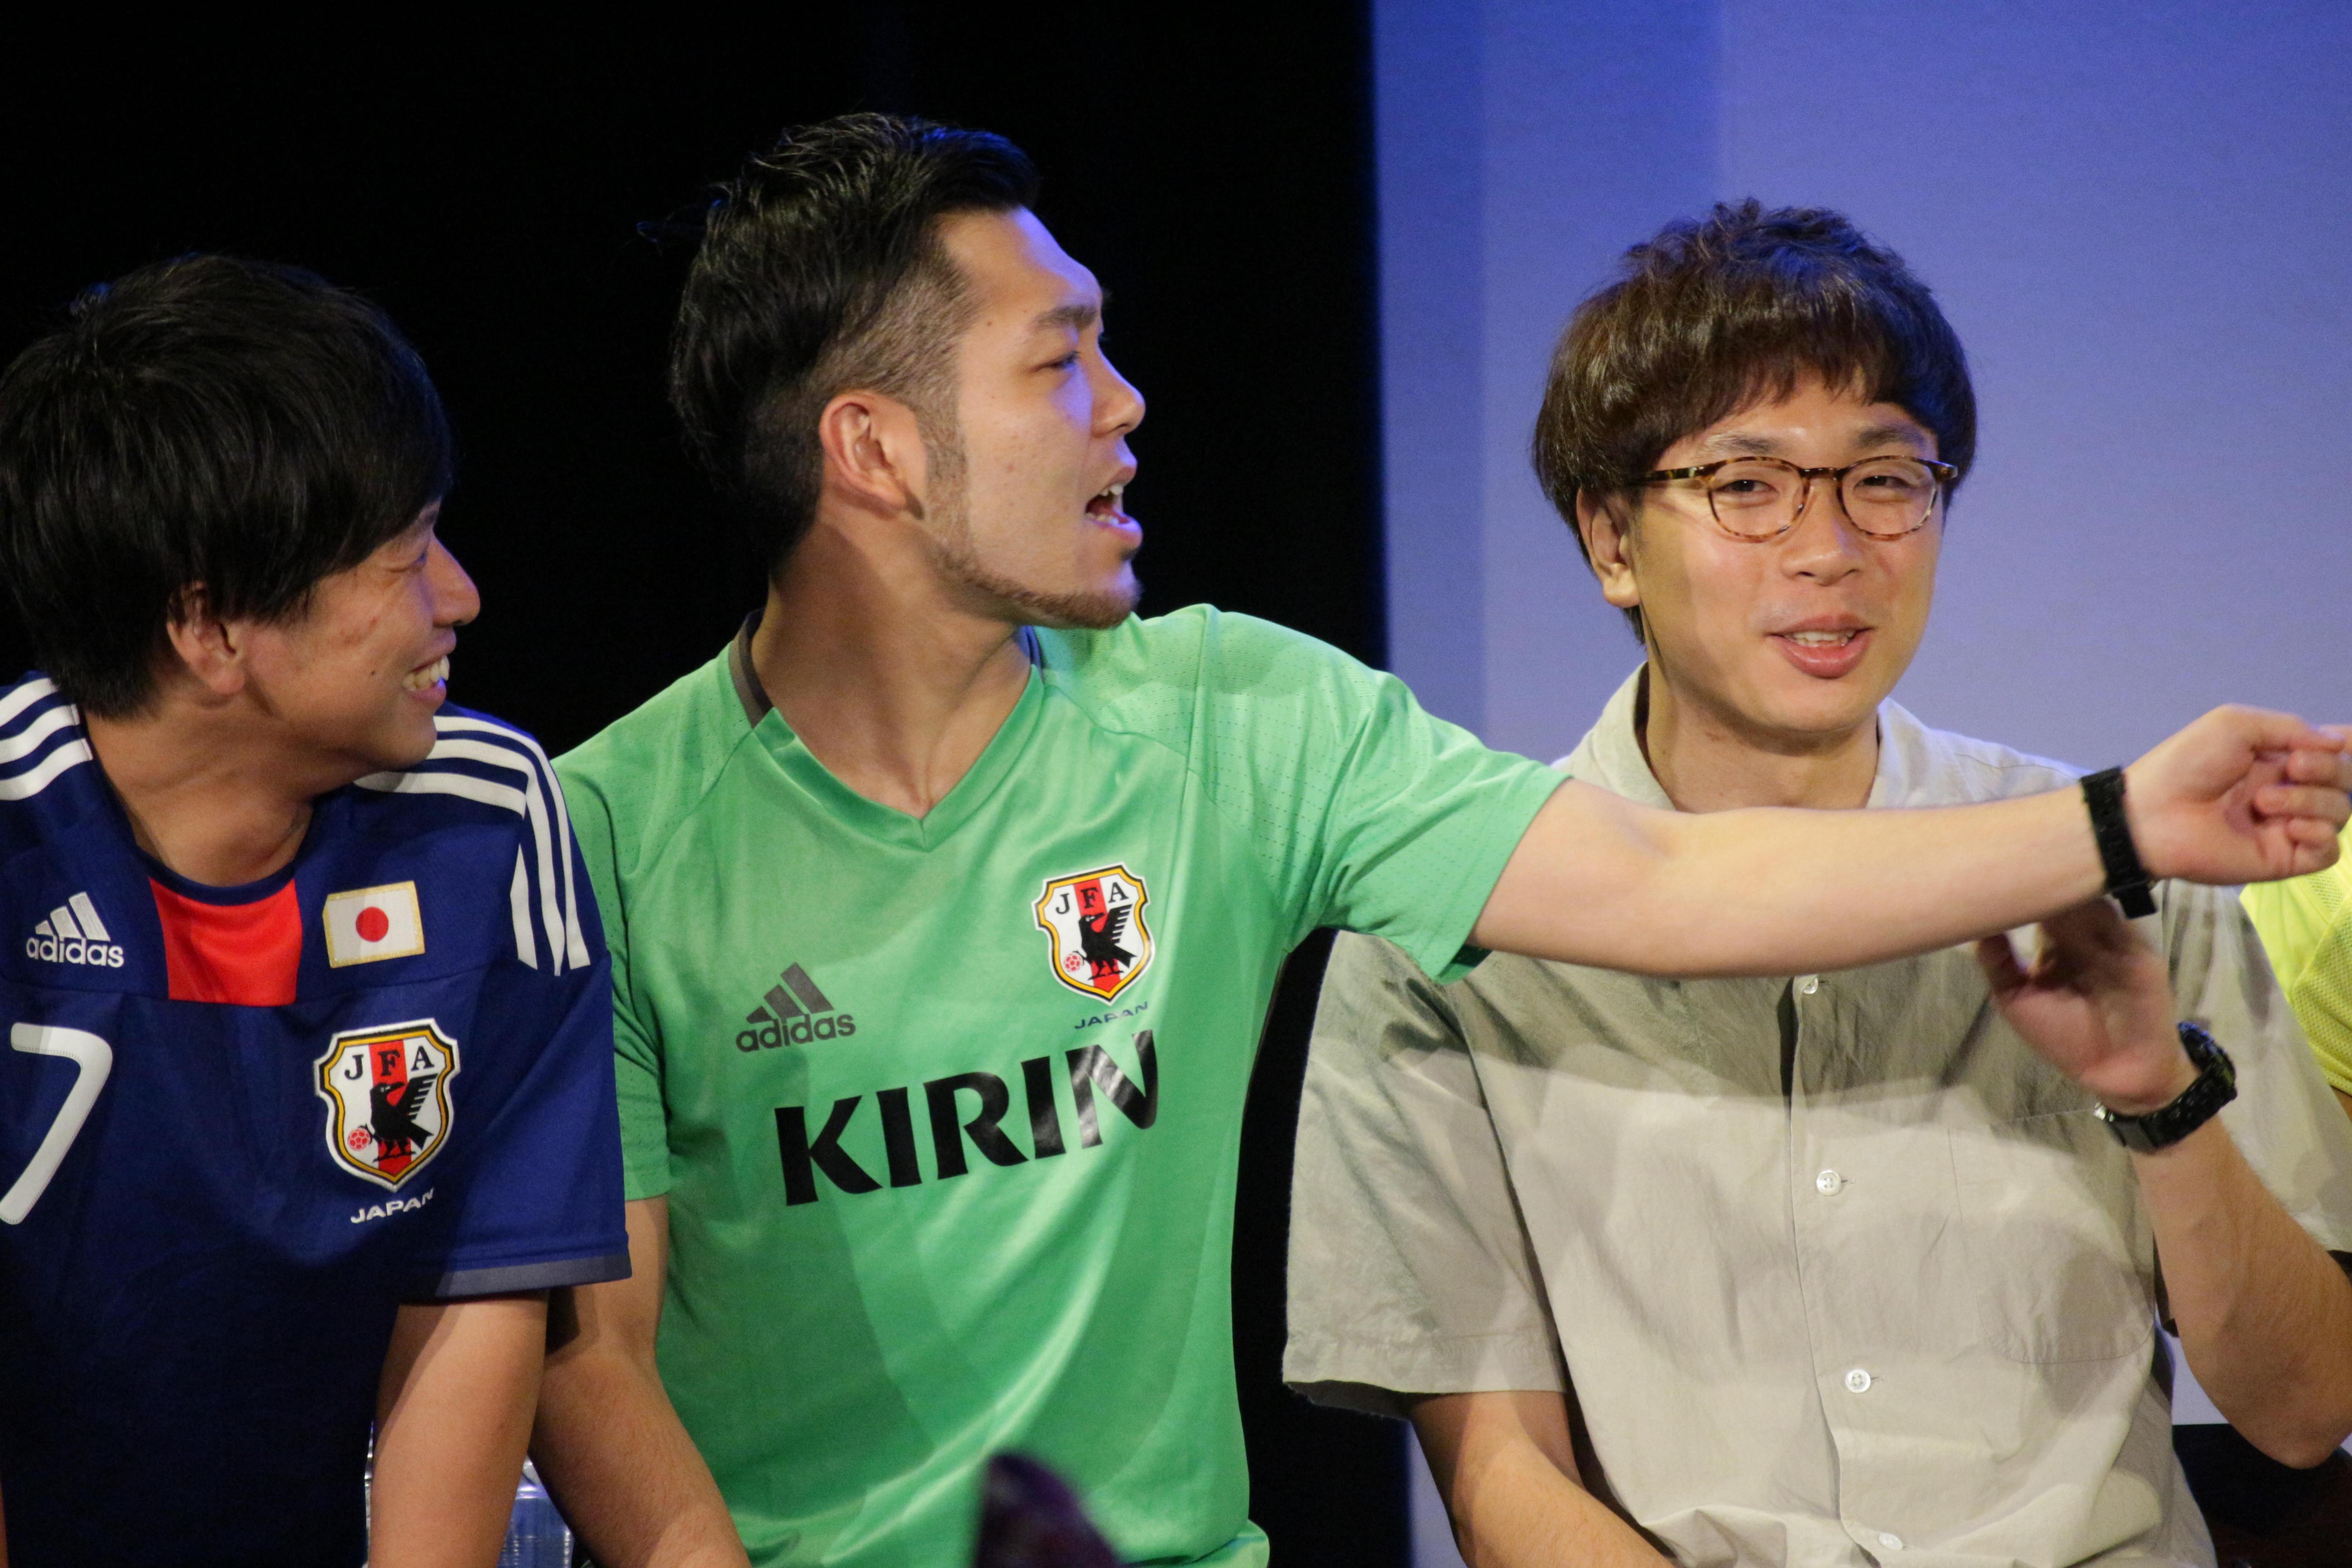 http://news.yoshimoto.co.jp/20180608002352-e2c86ef365b7274a3f1e384e7950de89ea02de15.jpg